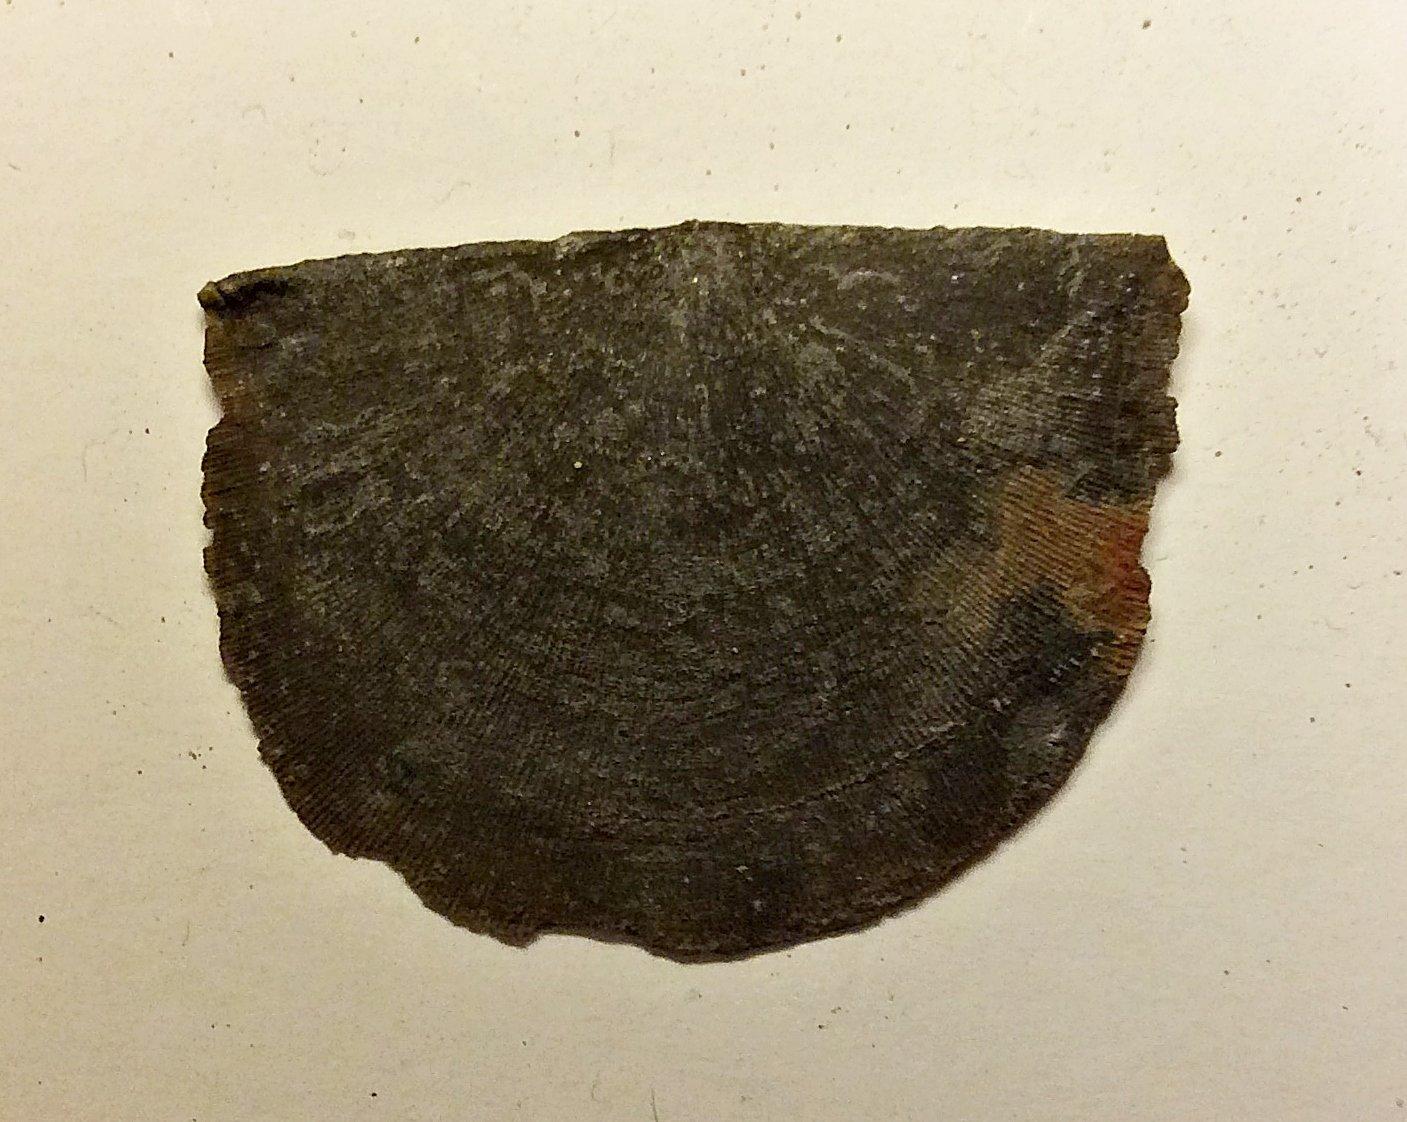 Strophomenid Brachiopod from Deep Springs Road